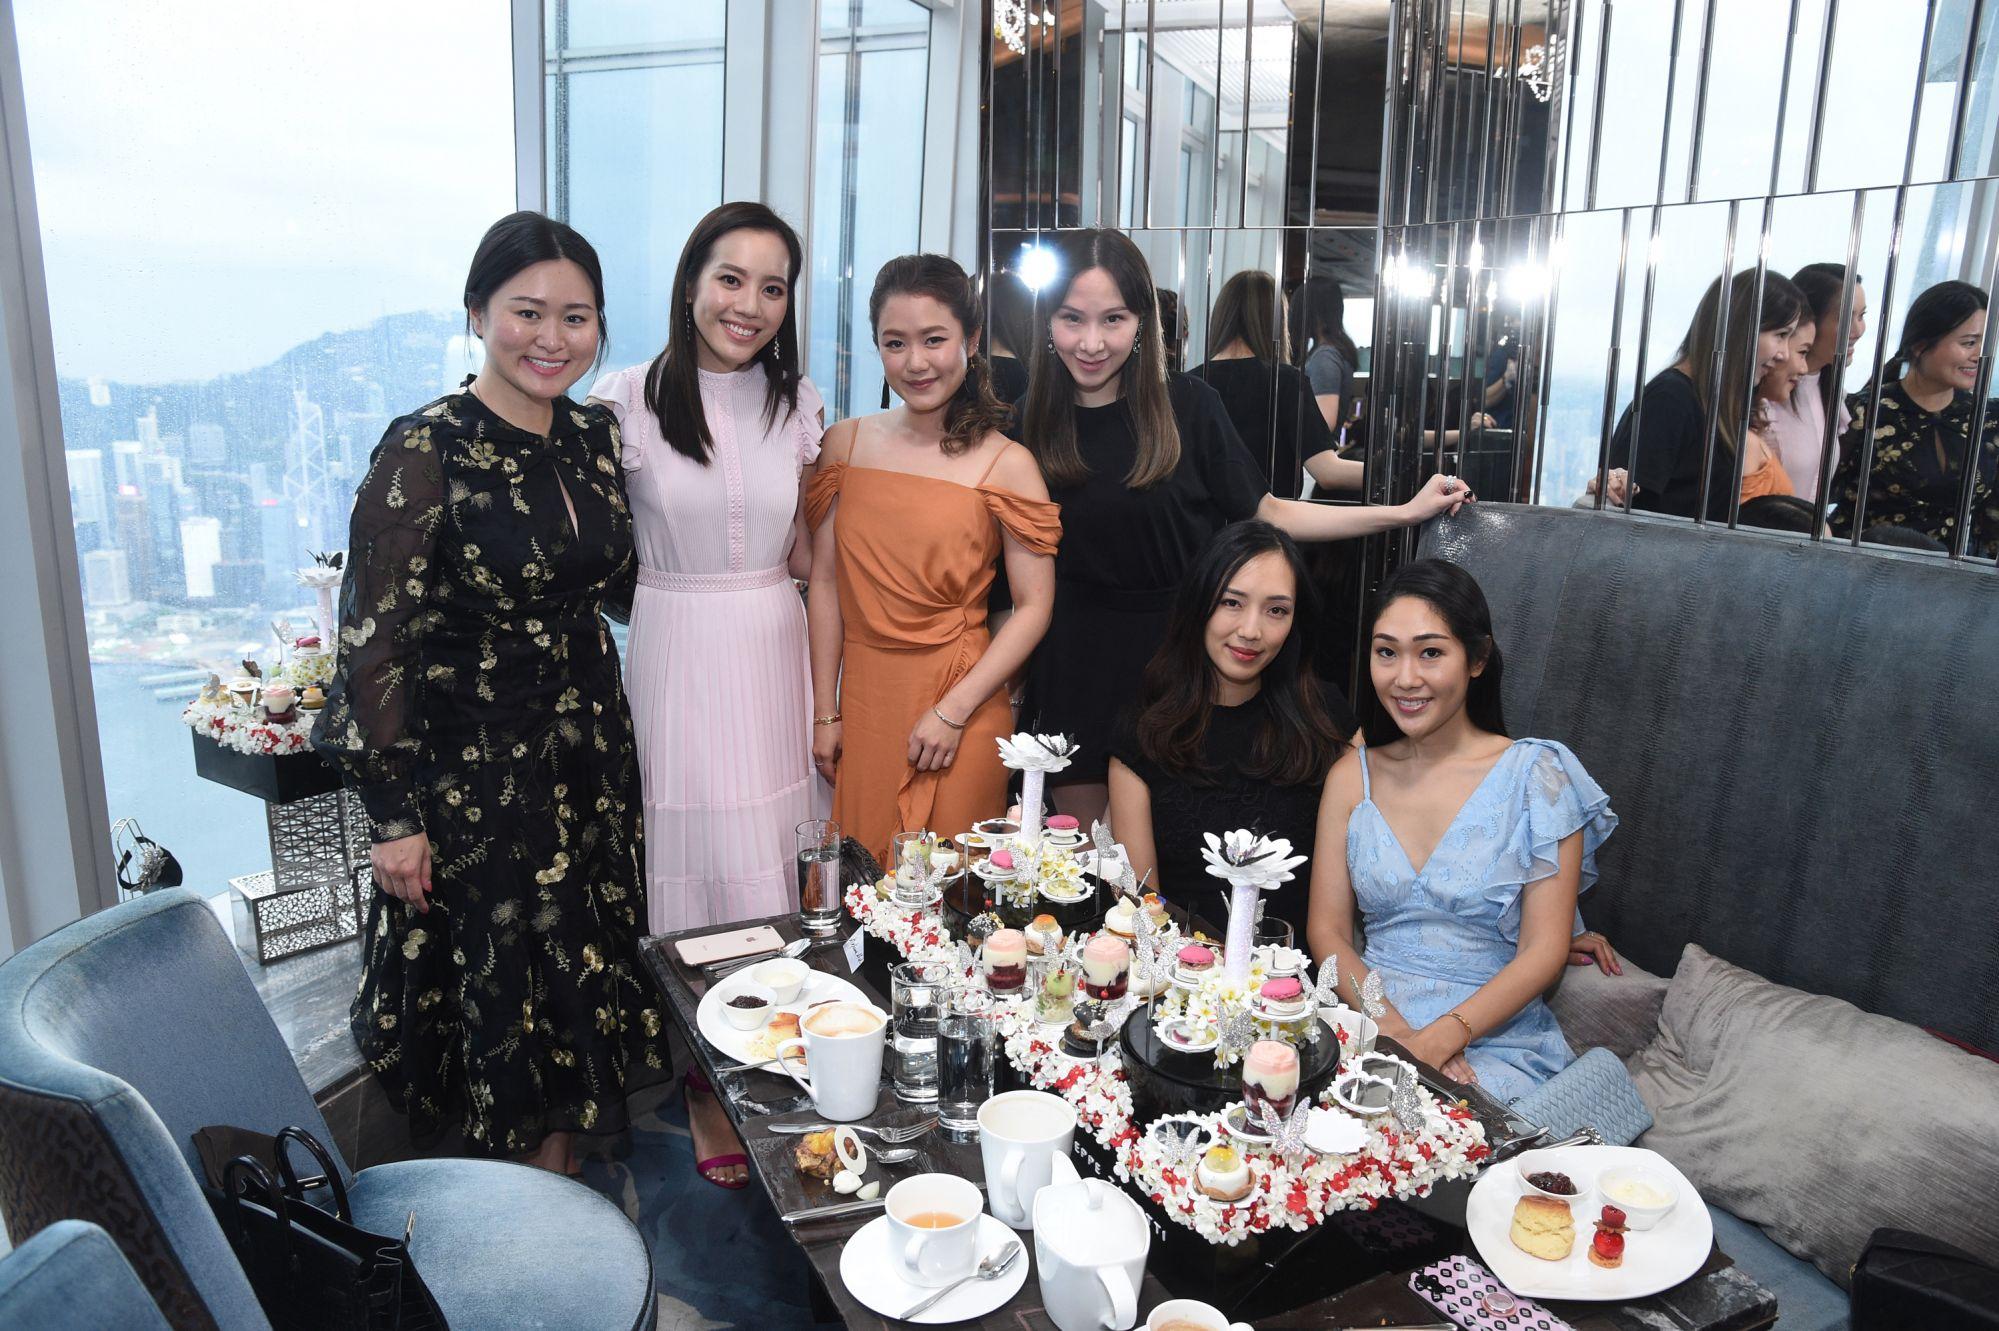 Victoria Chan, Jessica Jann, Pearl Shek, Stephnie Shek, Christine Fok, Nat Kwan